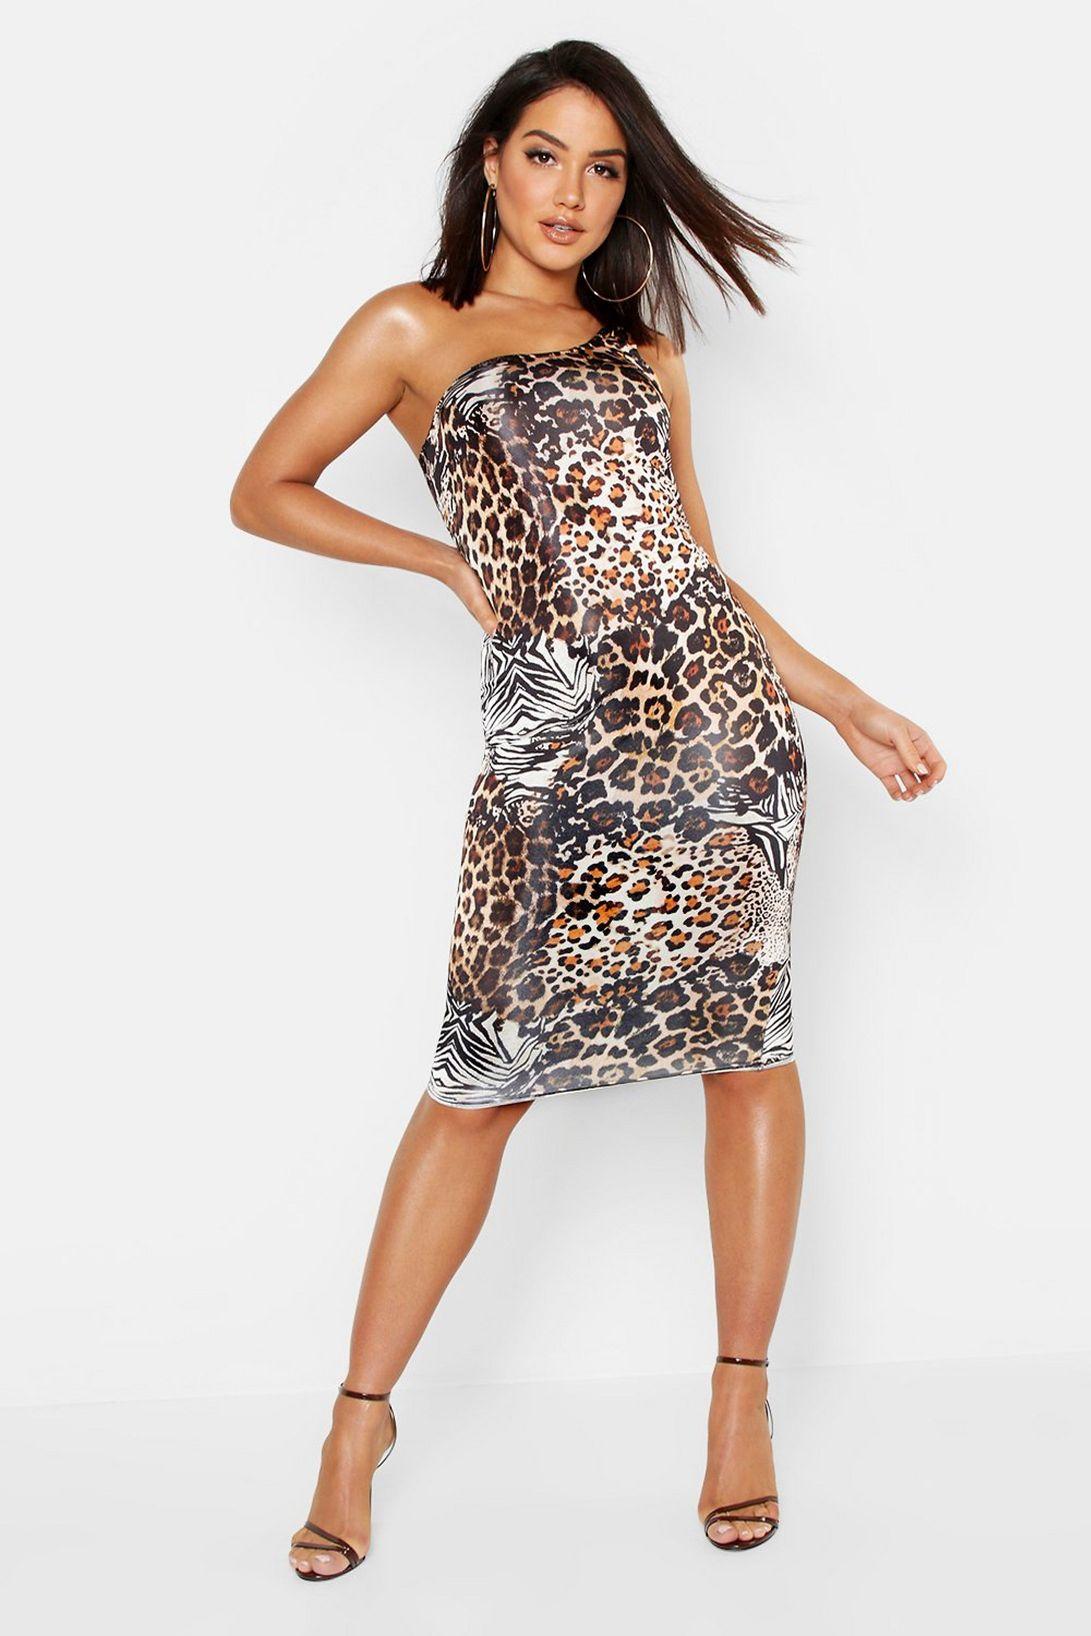 Animal print one shoulder midi dress £4 + £3.99 delivery at boohoo